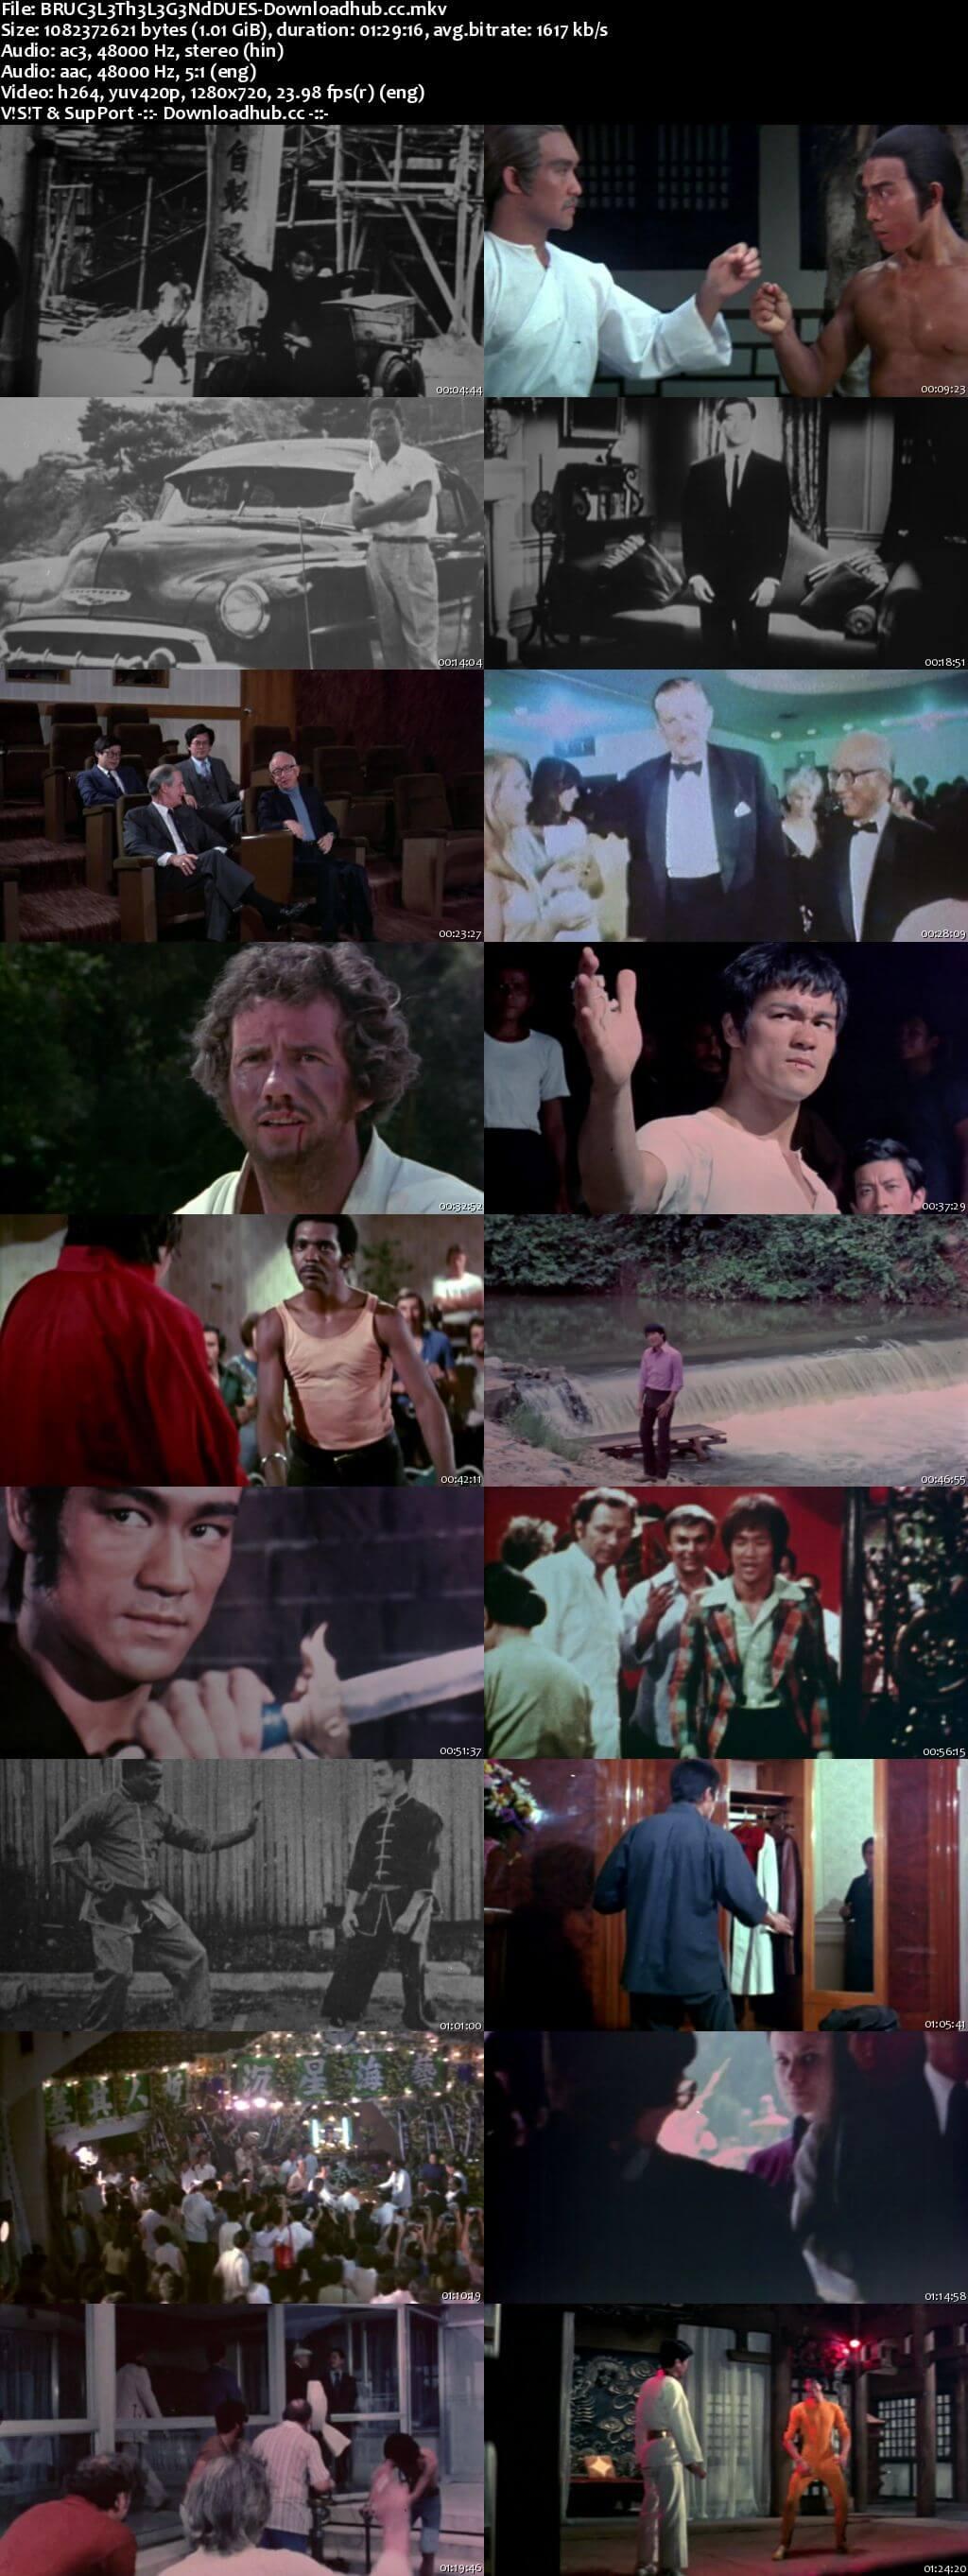 Bruce Lee the Legend 1984 Dual Audio 720p HDTV [Hindi - English]